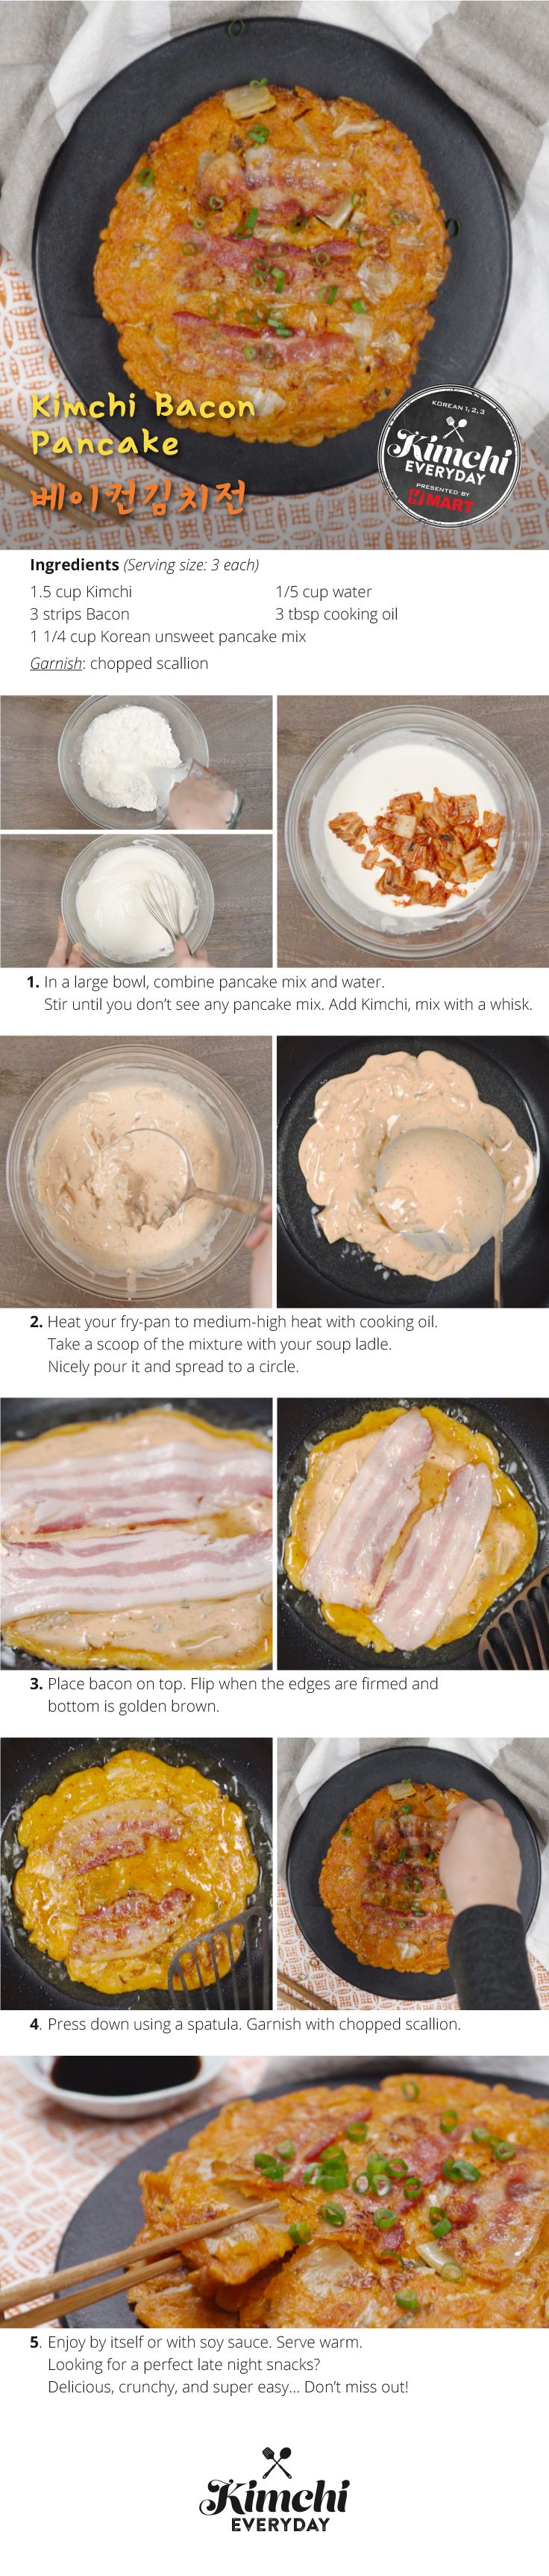 Hmart presents: How to make Kimchi Bacon Pancake